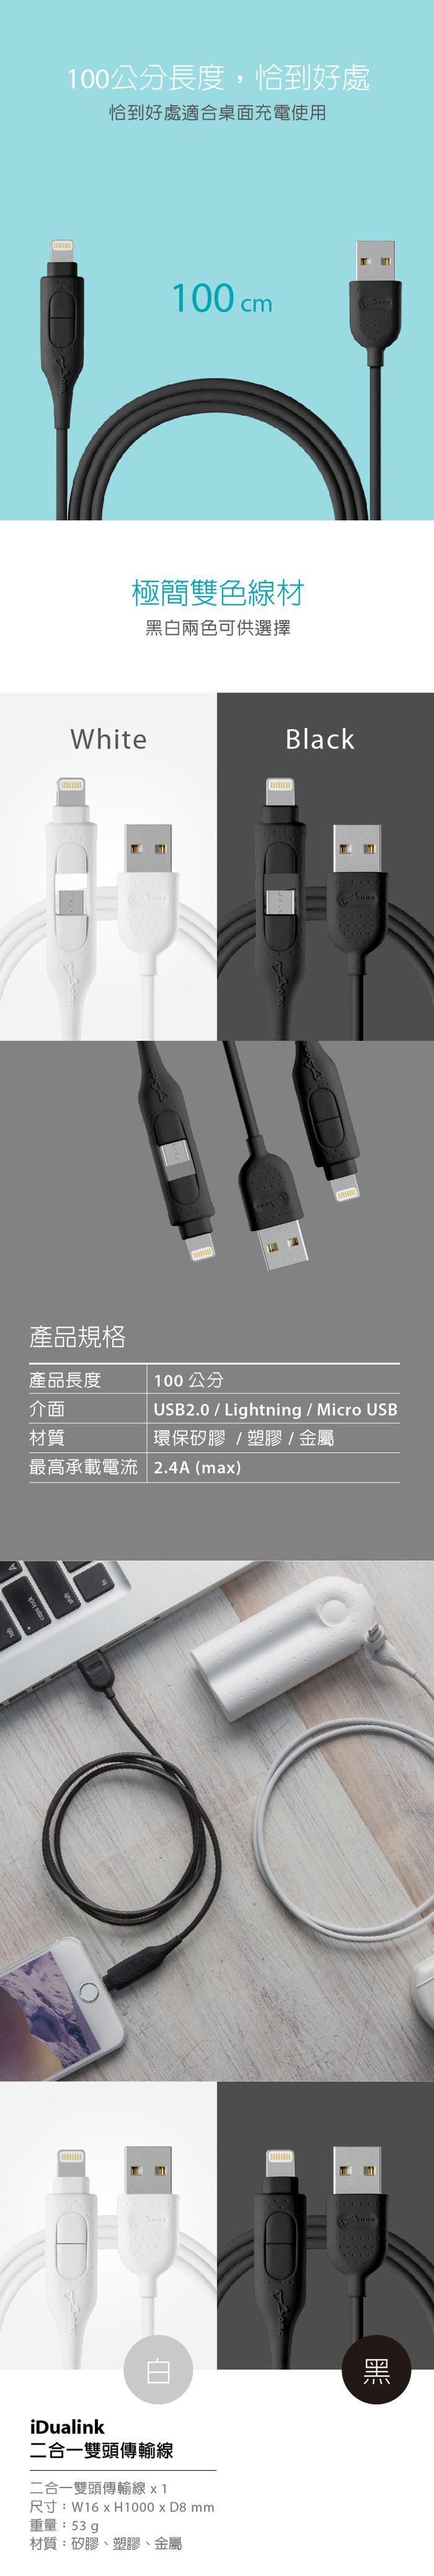 Bone │ 二合一雙頭傳輸線 ( Lightning / micro USB ) - 黑 / 白